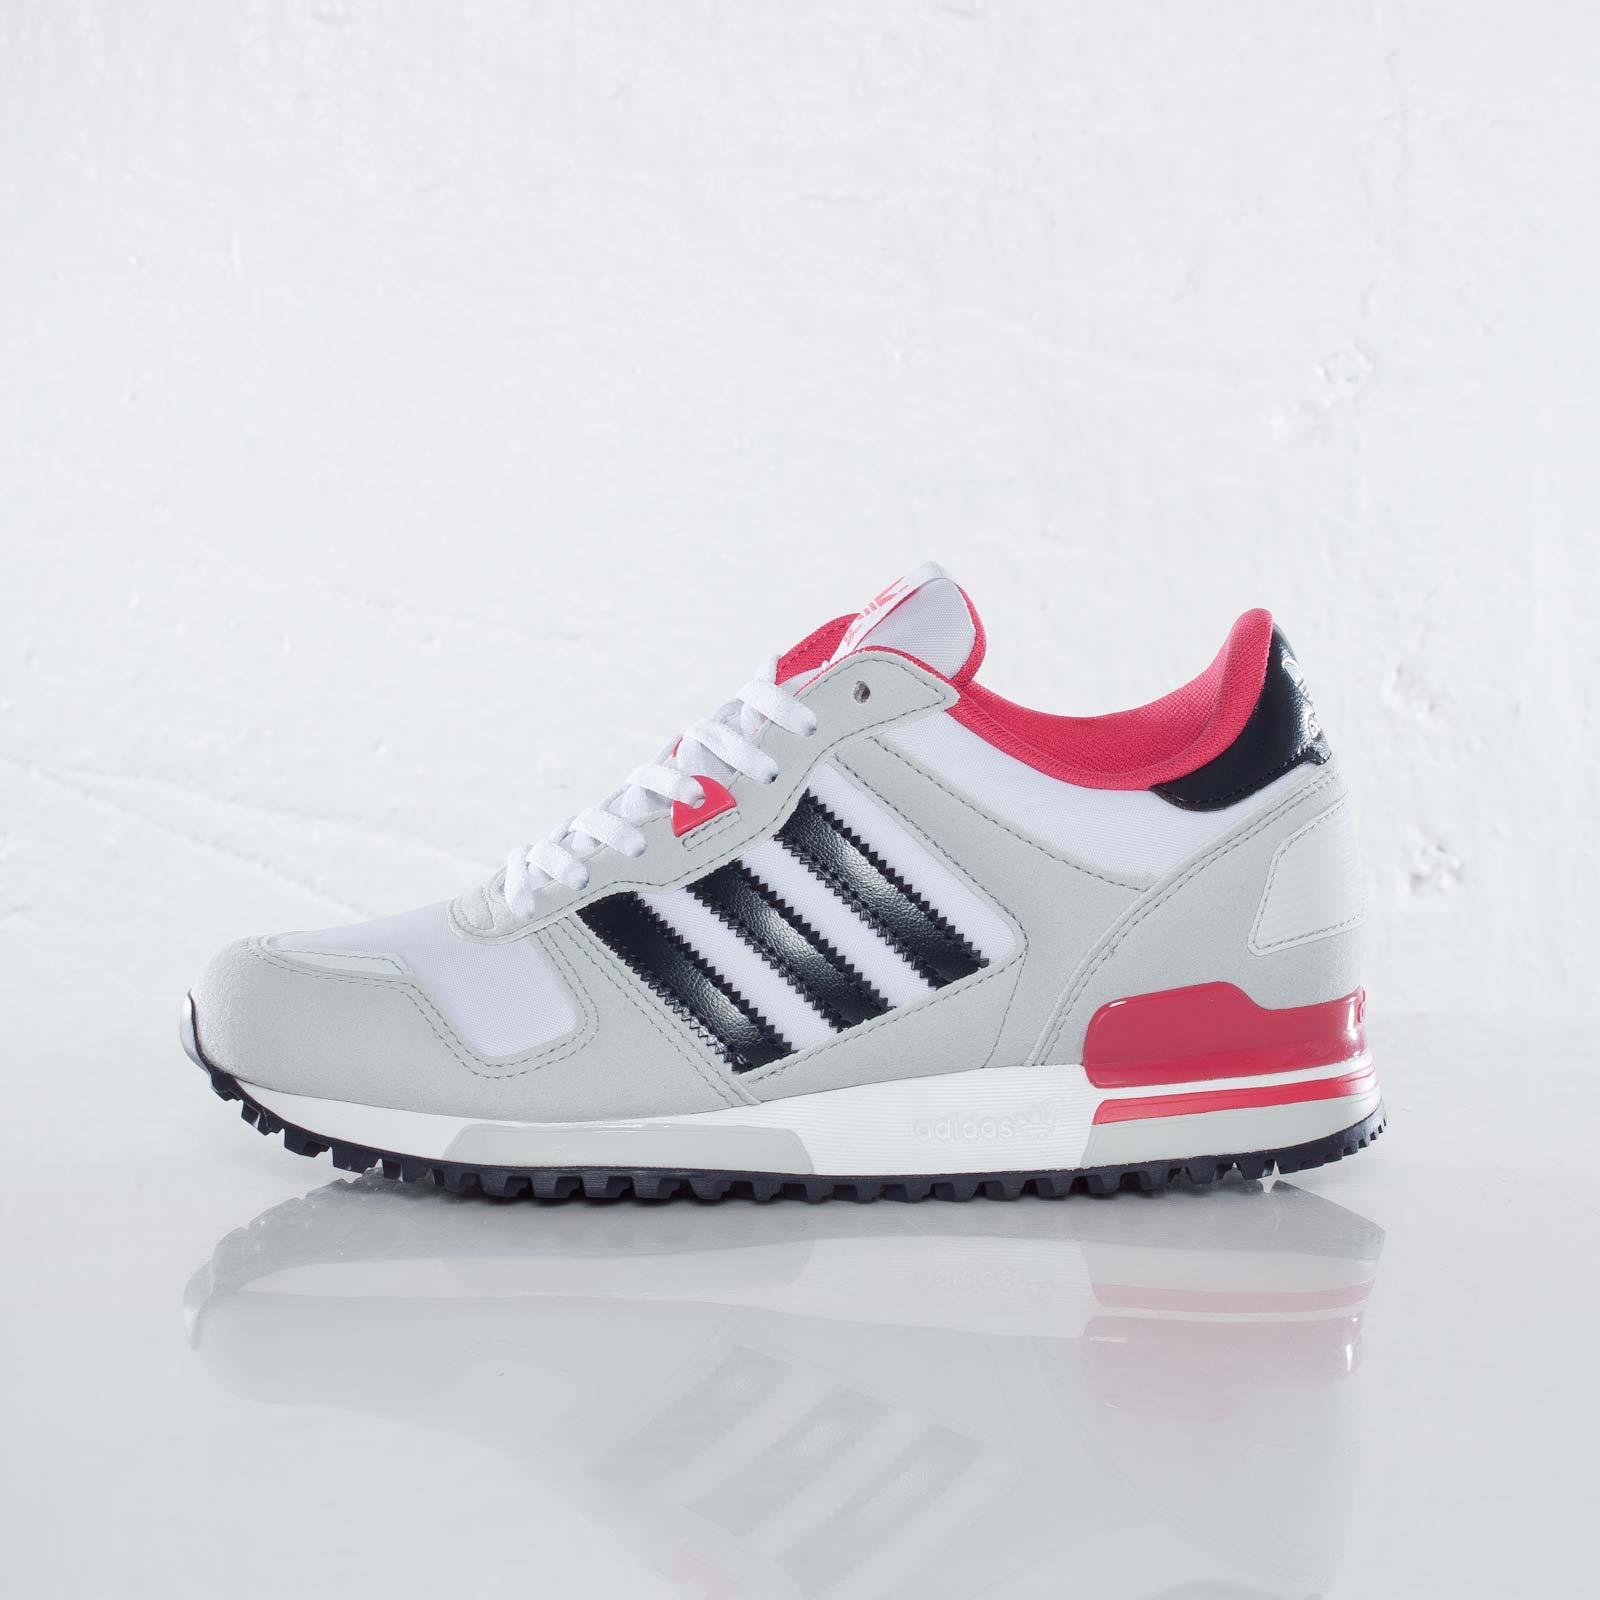 Adidas zx 700 W q20698 sneakersnstuff zapatilla & Streetwear